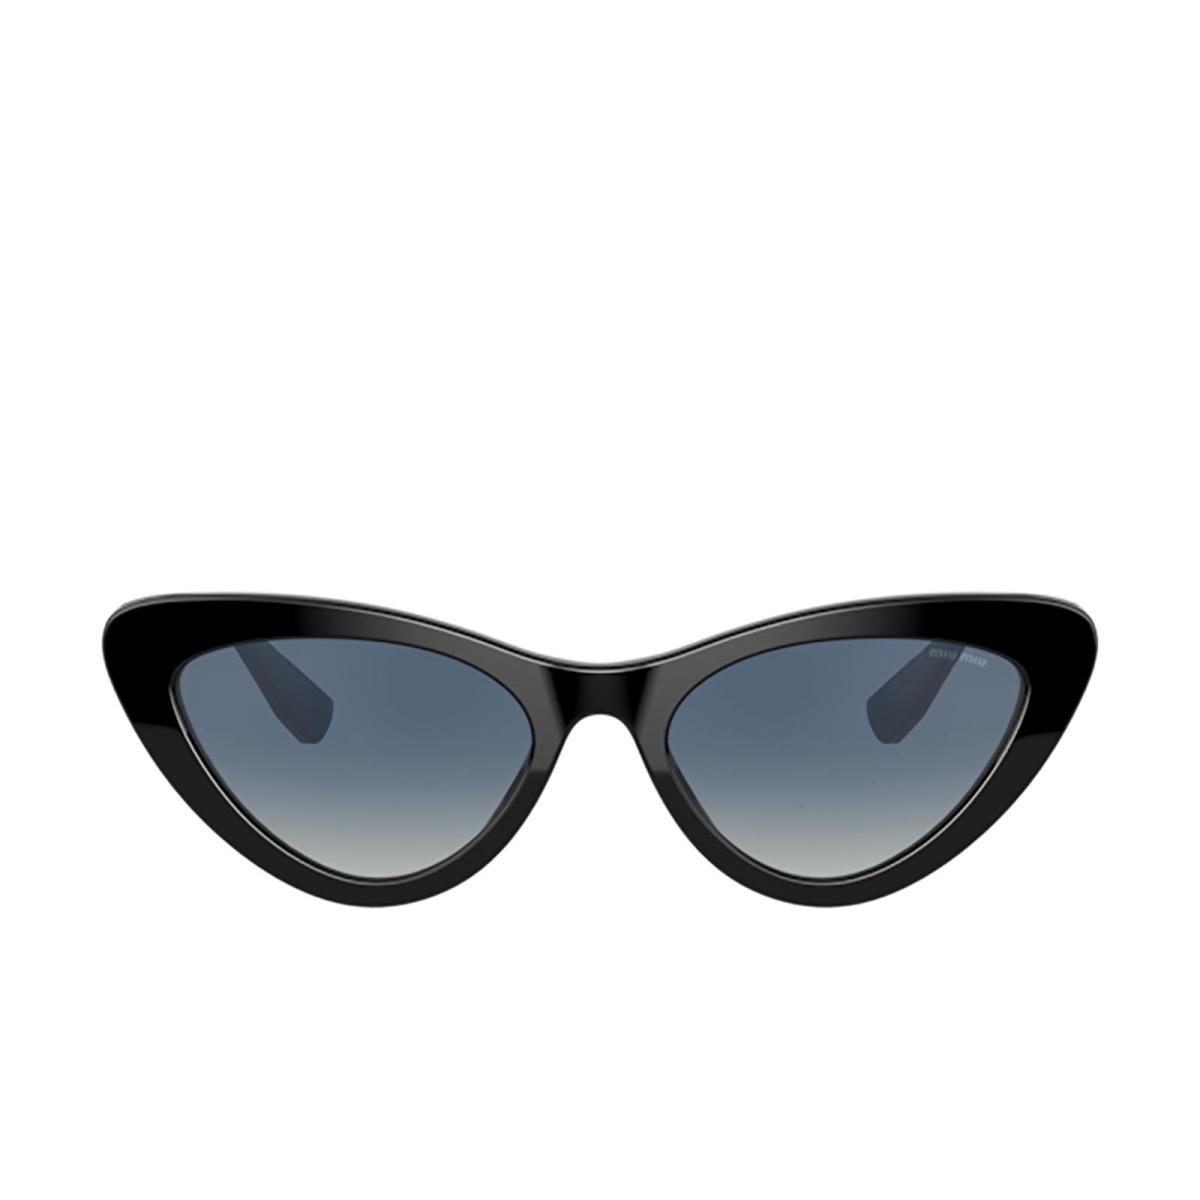 Miu Miu® Cat-eye Sunglasses: MU 01VS color Black 1AB3A0.